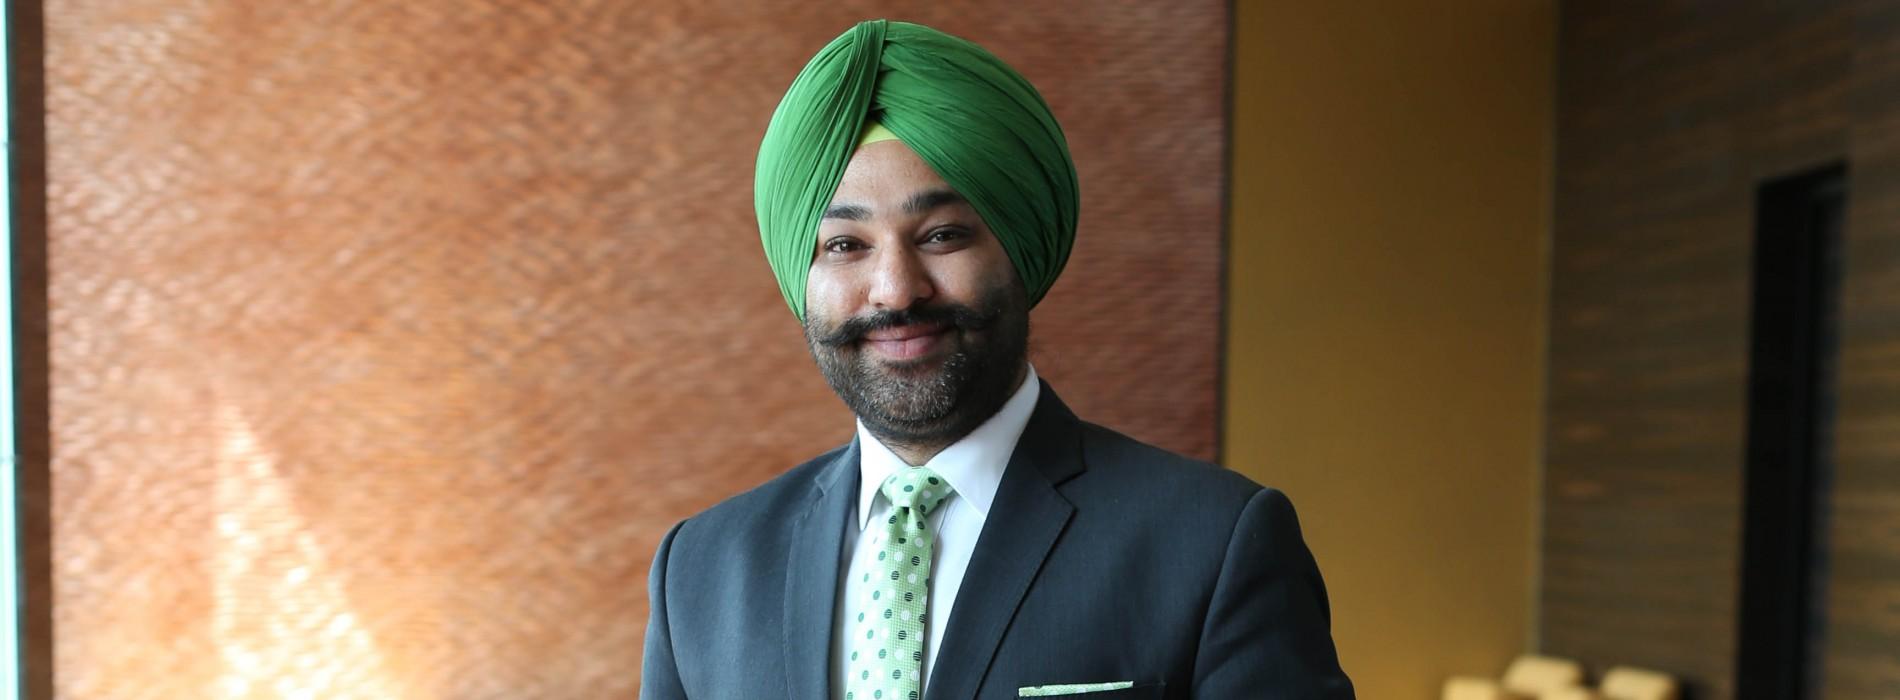 Karanbir Singh Gulati appointed as Director Food & Beverage at Renaissance Mumbai Convention Centre Hotel